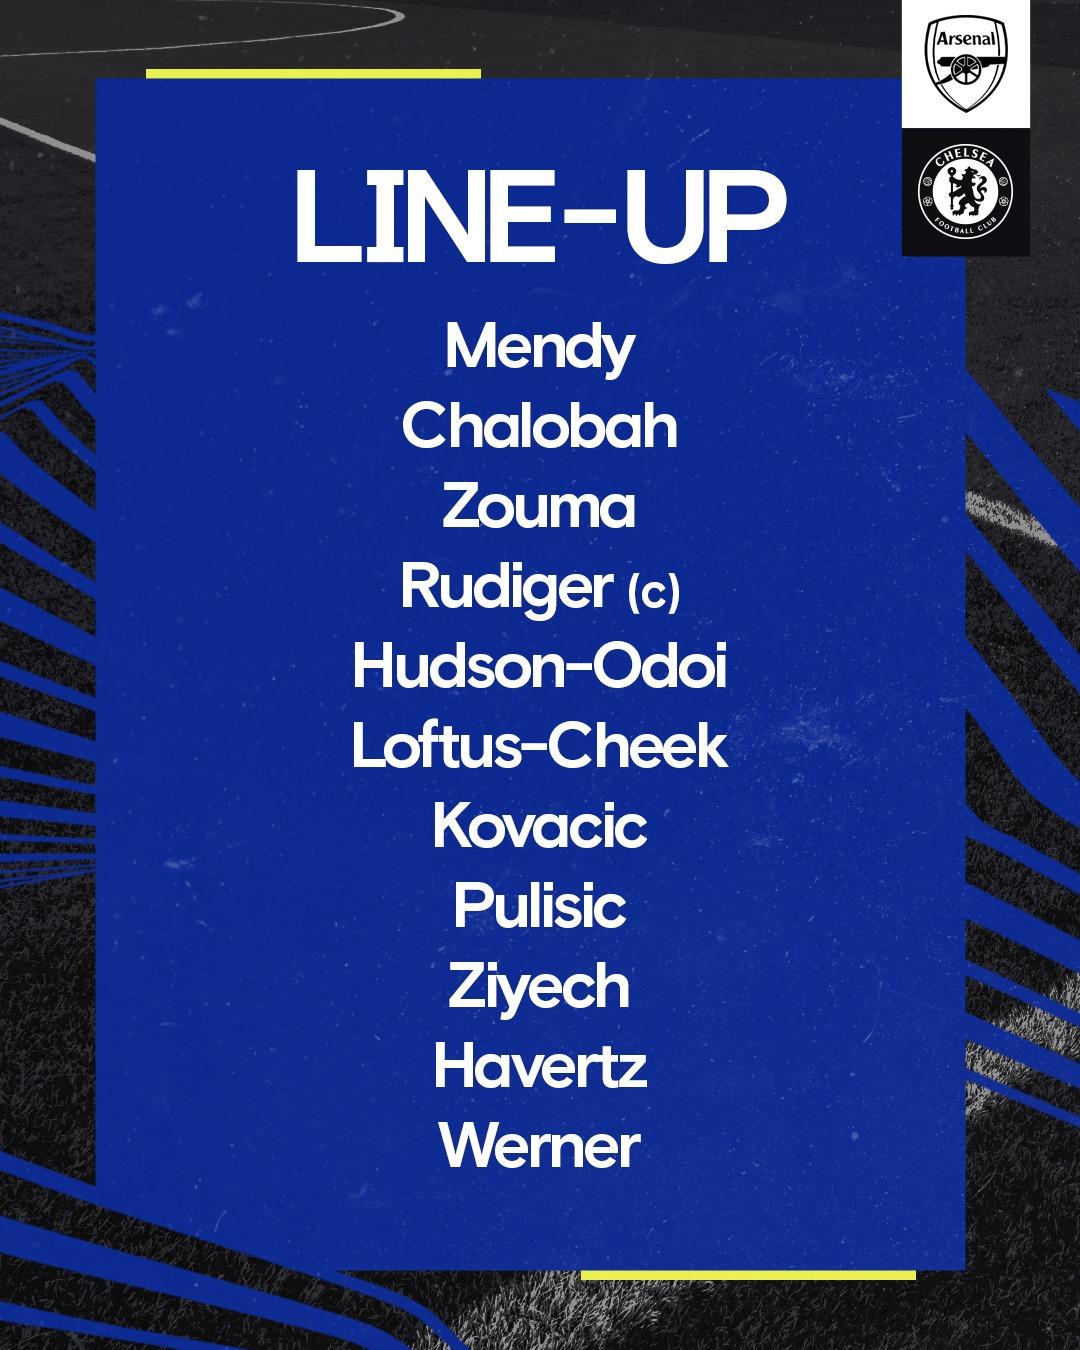 Trực tiếp Chelsea vs Arsenal, link xem trực tiếp Chelsea vs Arsenal: 21h00 ngày 01/08 2